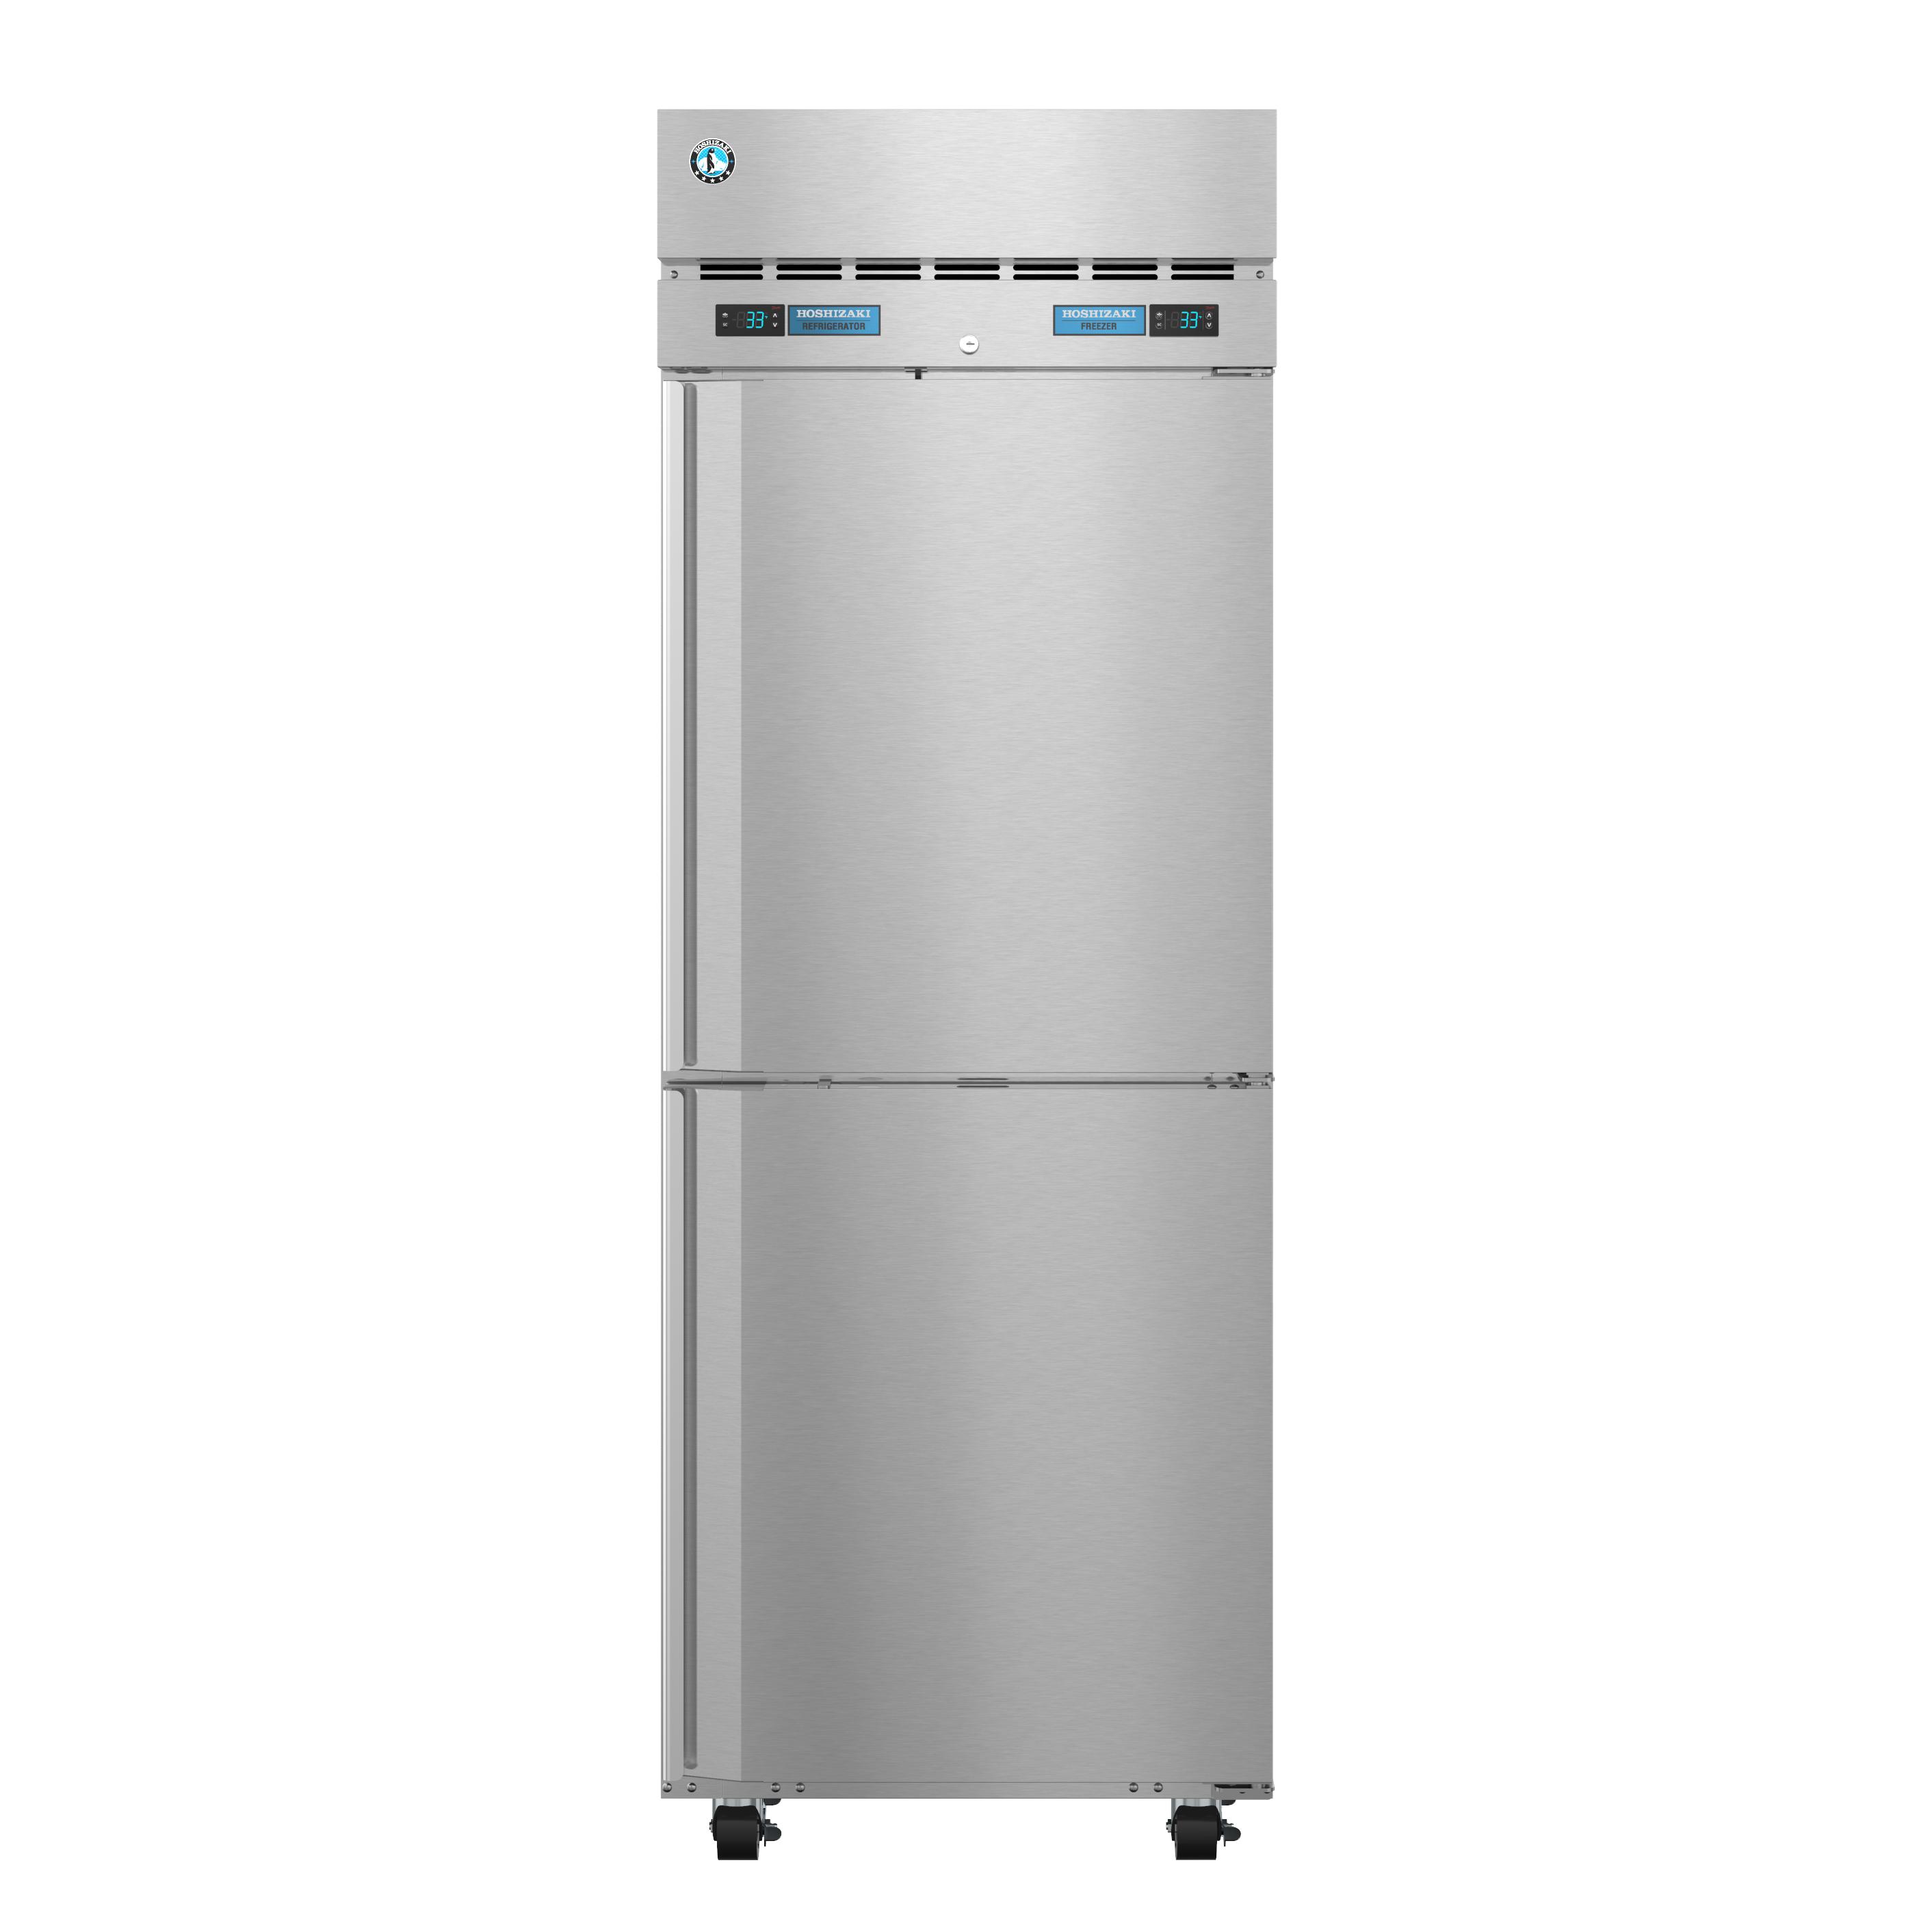 Hoshizaki DT1A-HS reach-in refrigerators & freezers